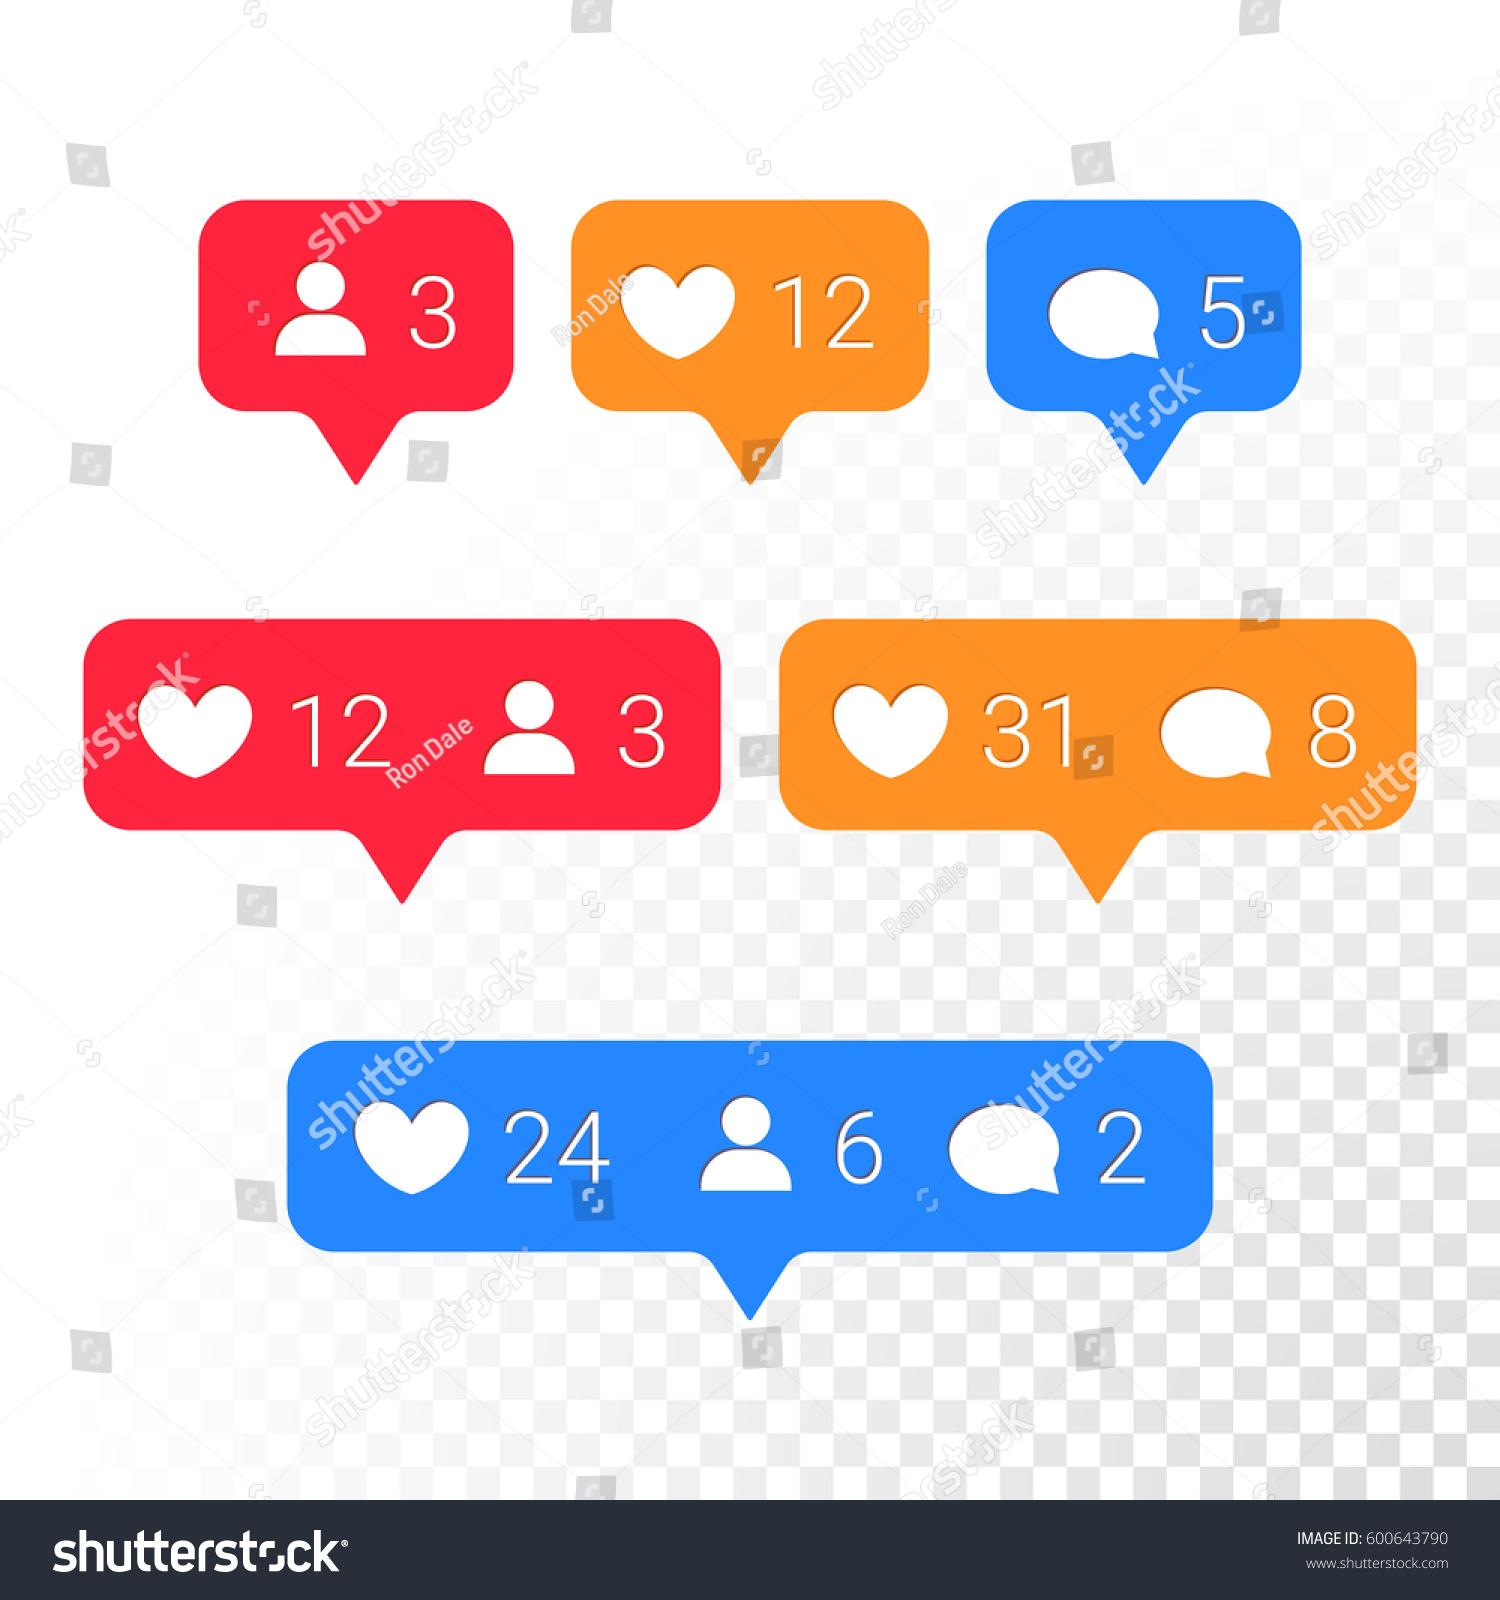 how to create a social network application like 2go